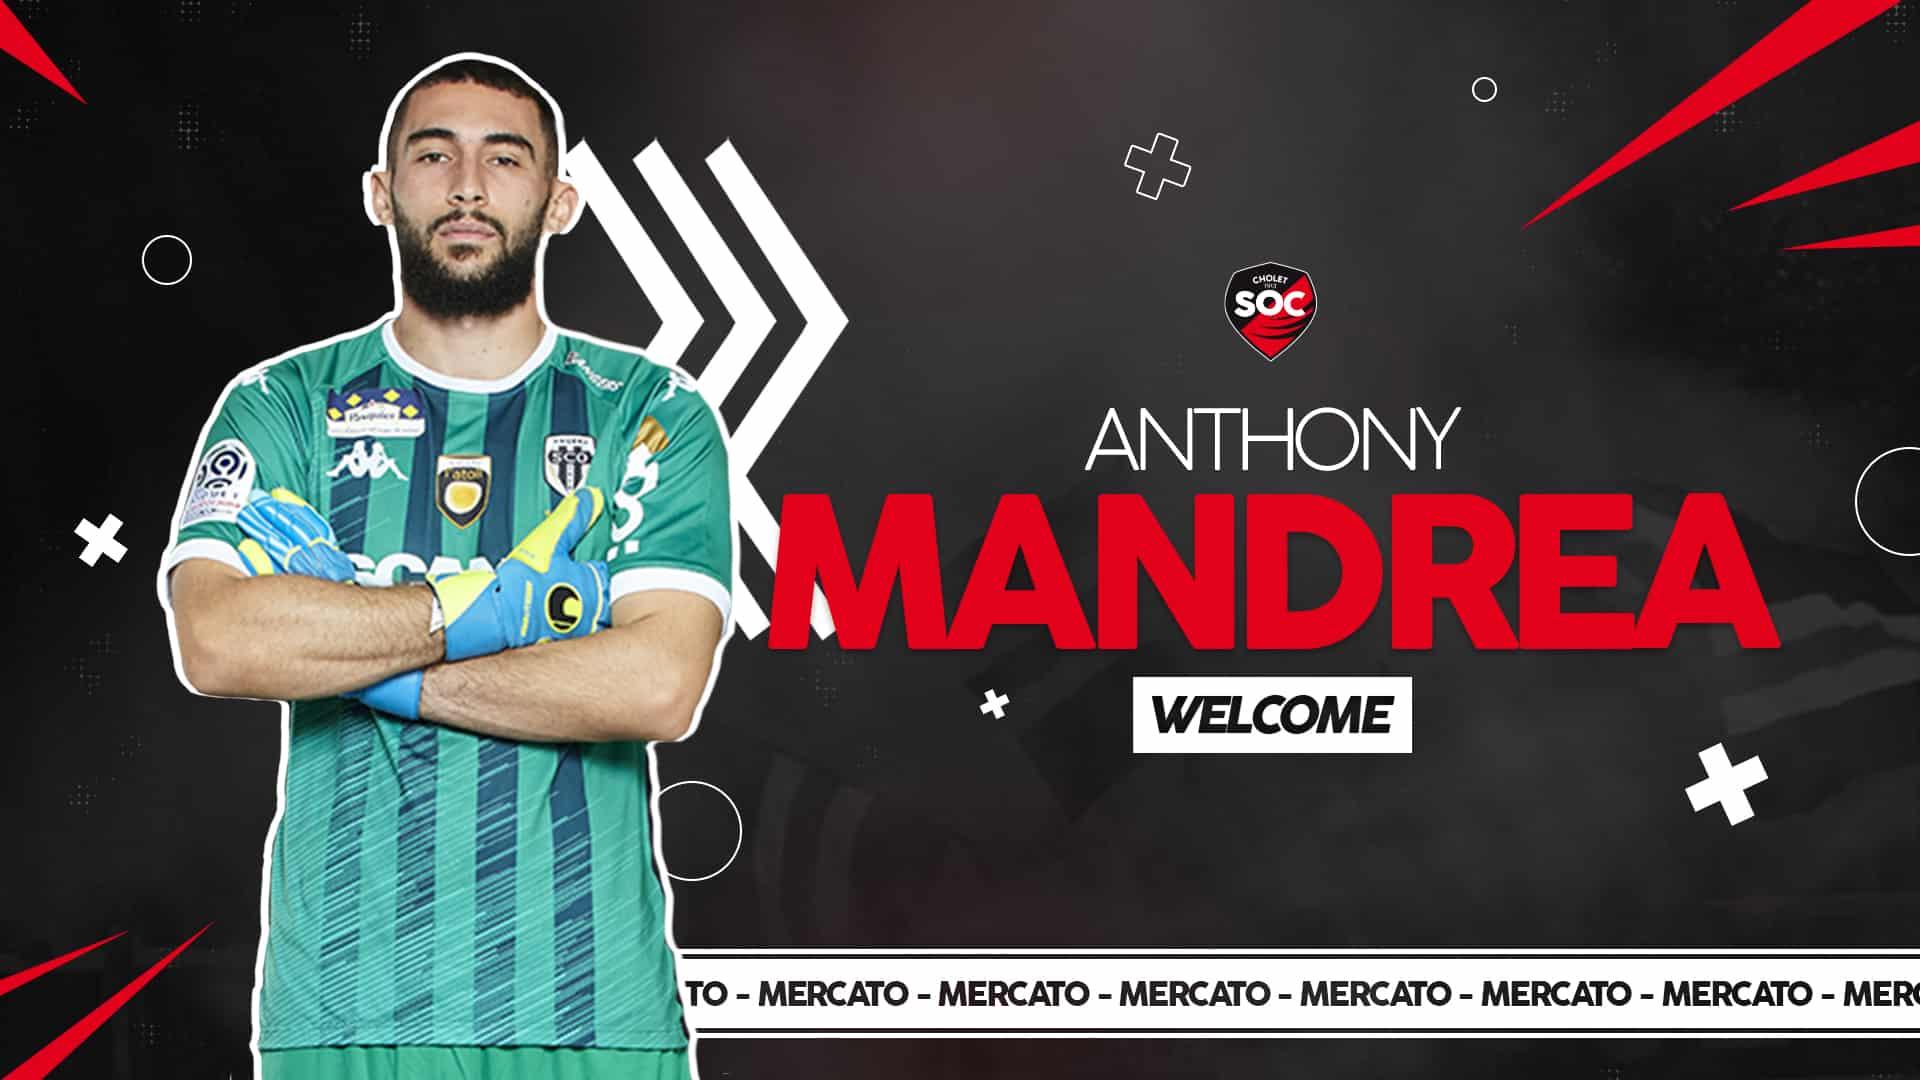 Recrue Anthony Mandrea